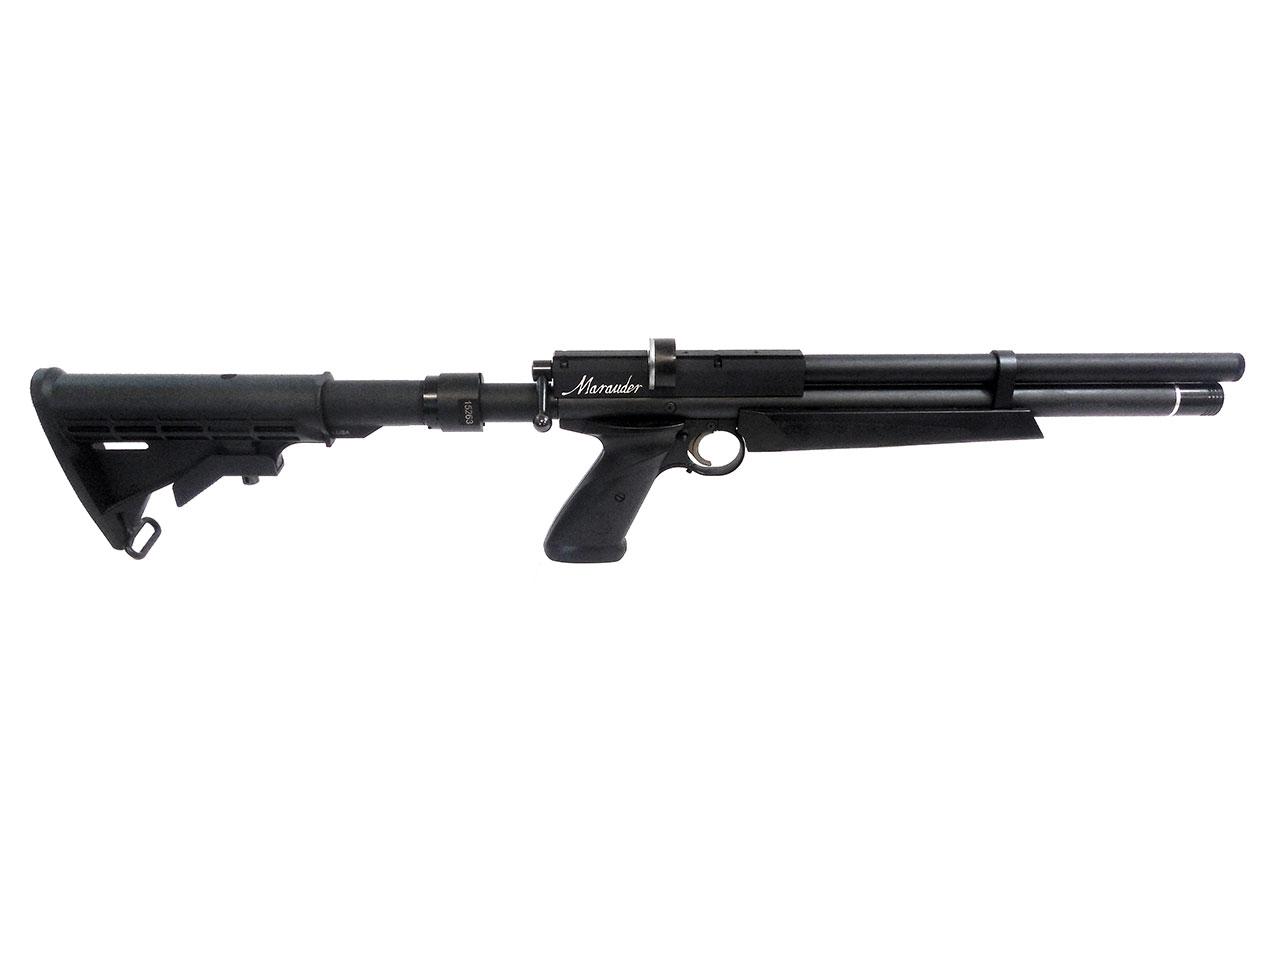 AR-15 Kit for Benjamin Marauder Pistol & Crosman Airguns RAI A005